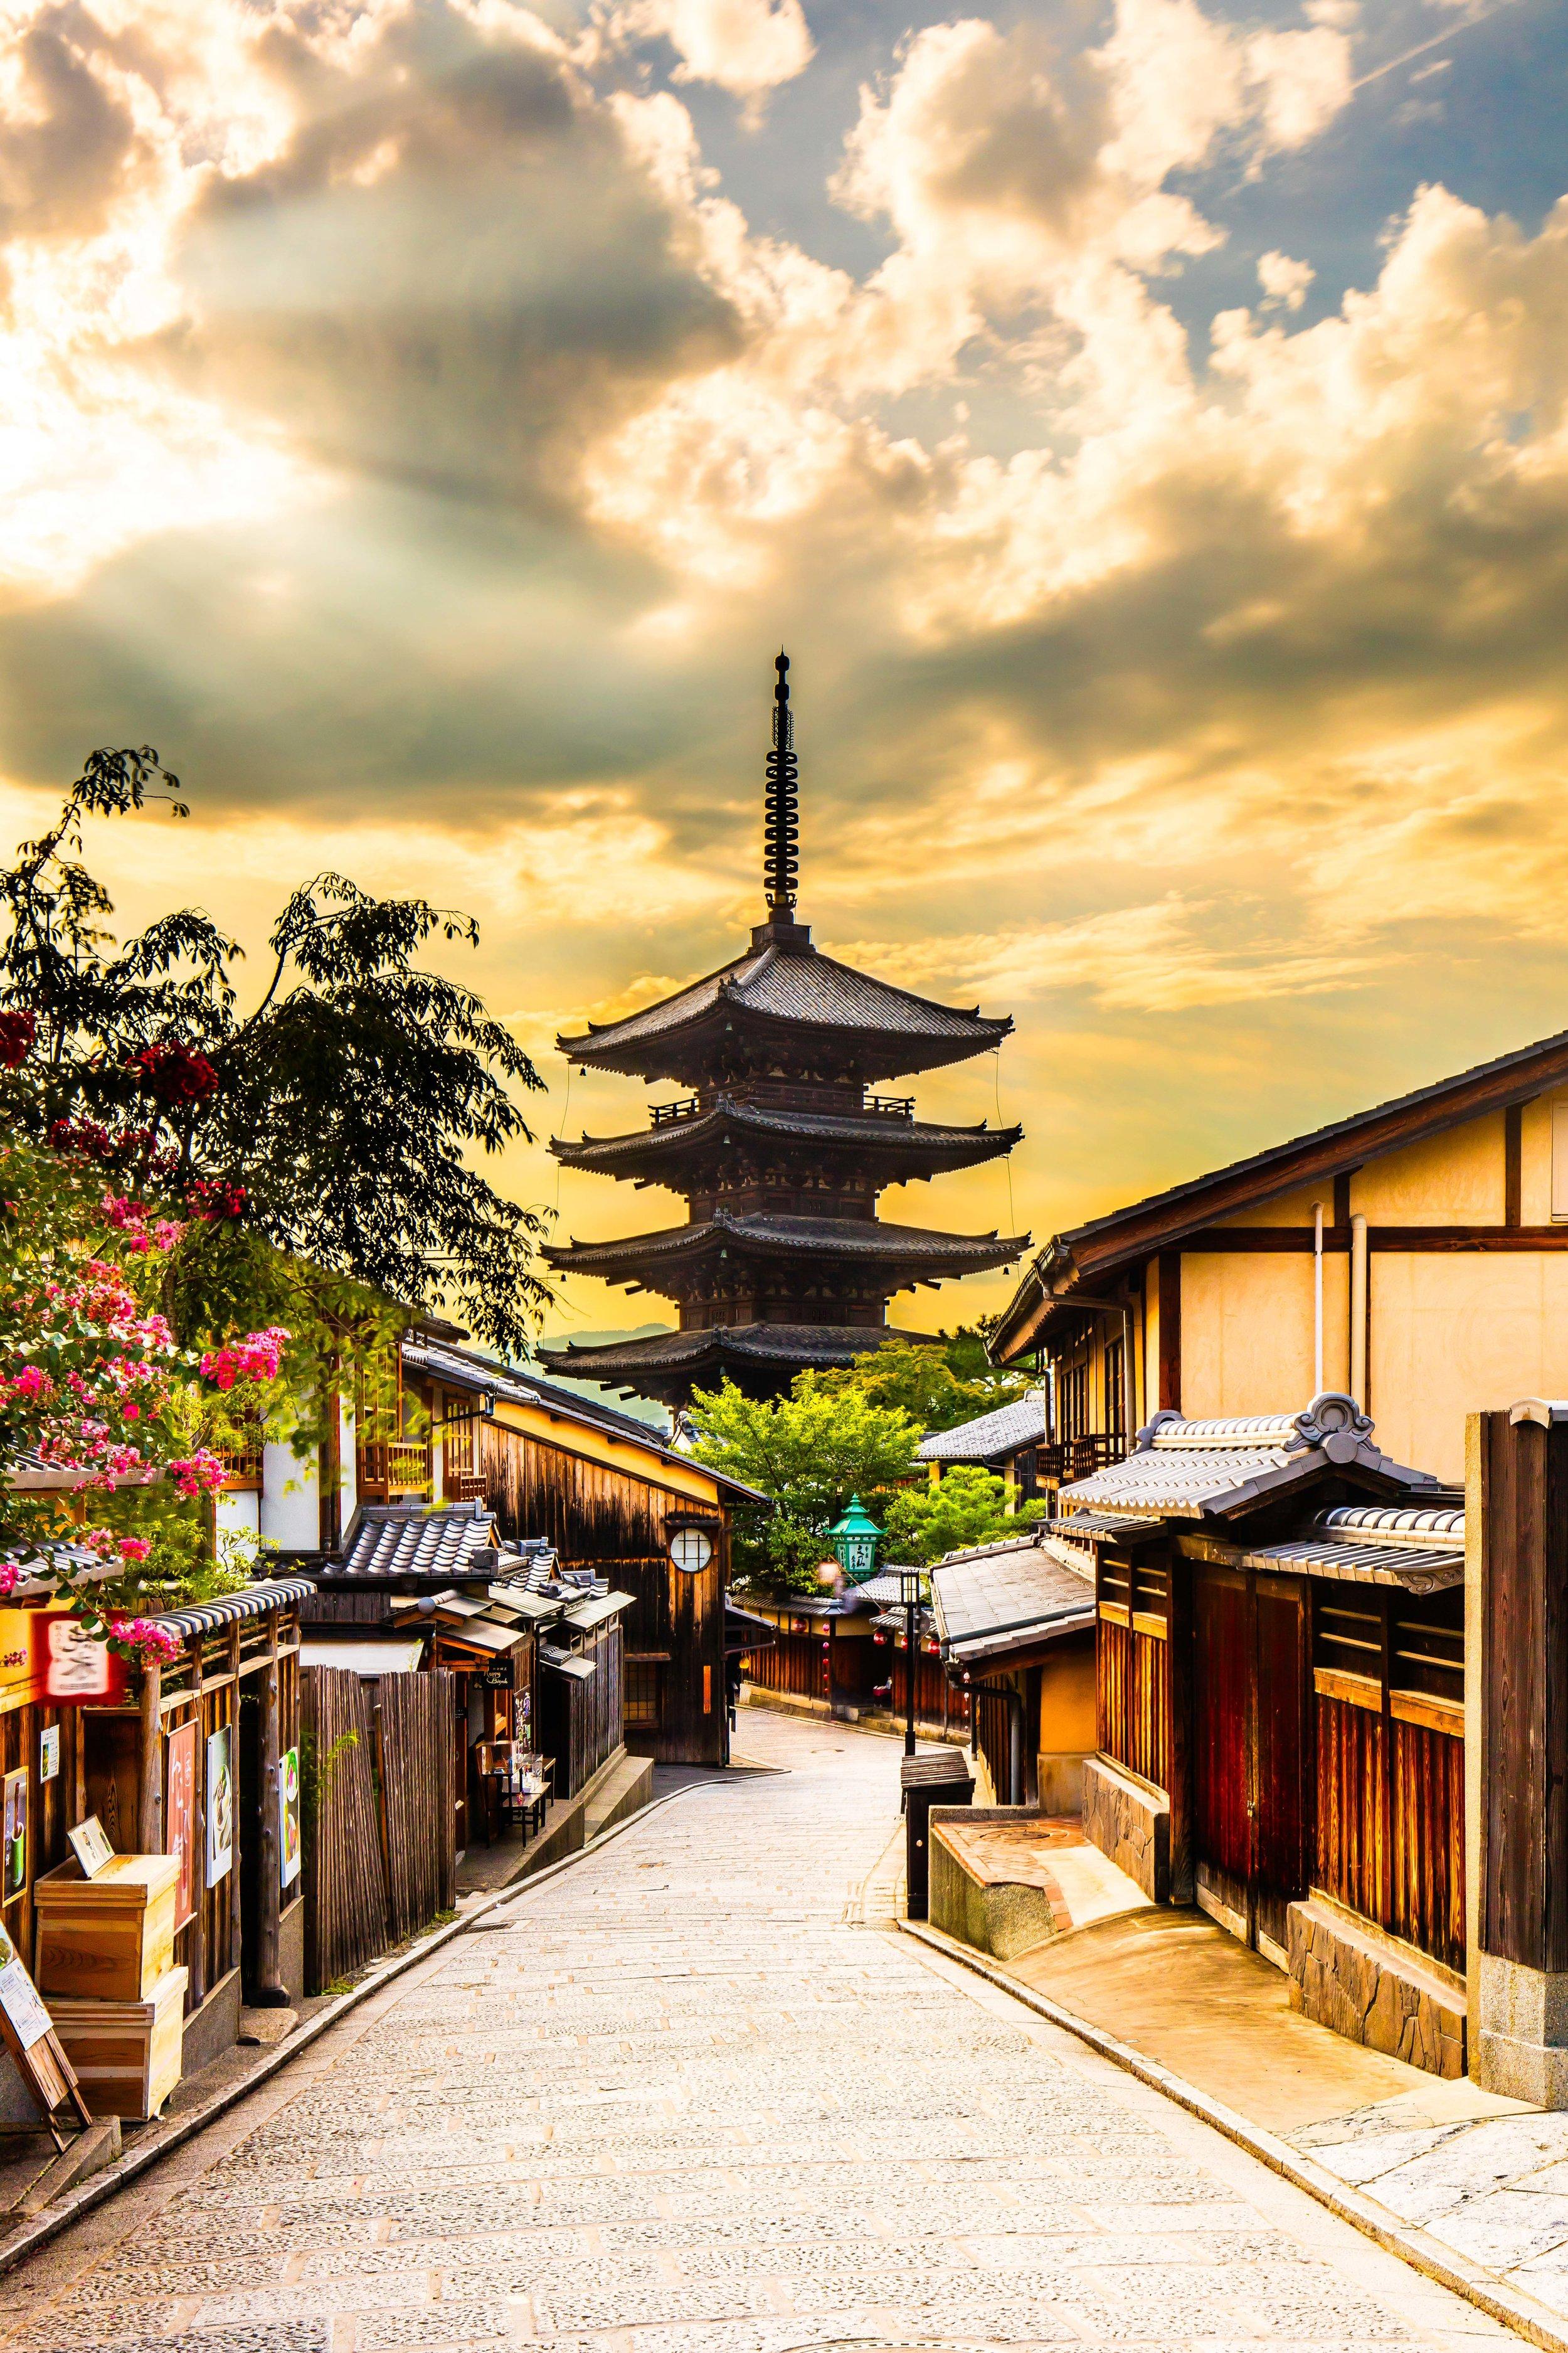 Kyoto 2016 #2